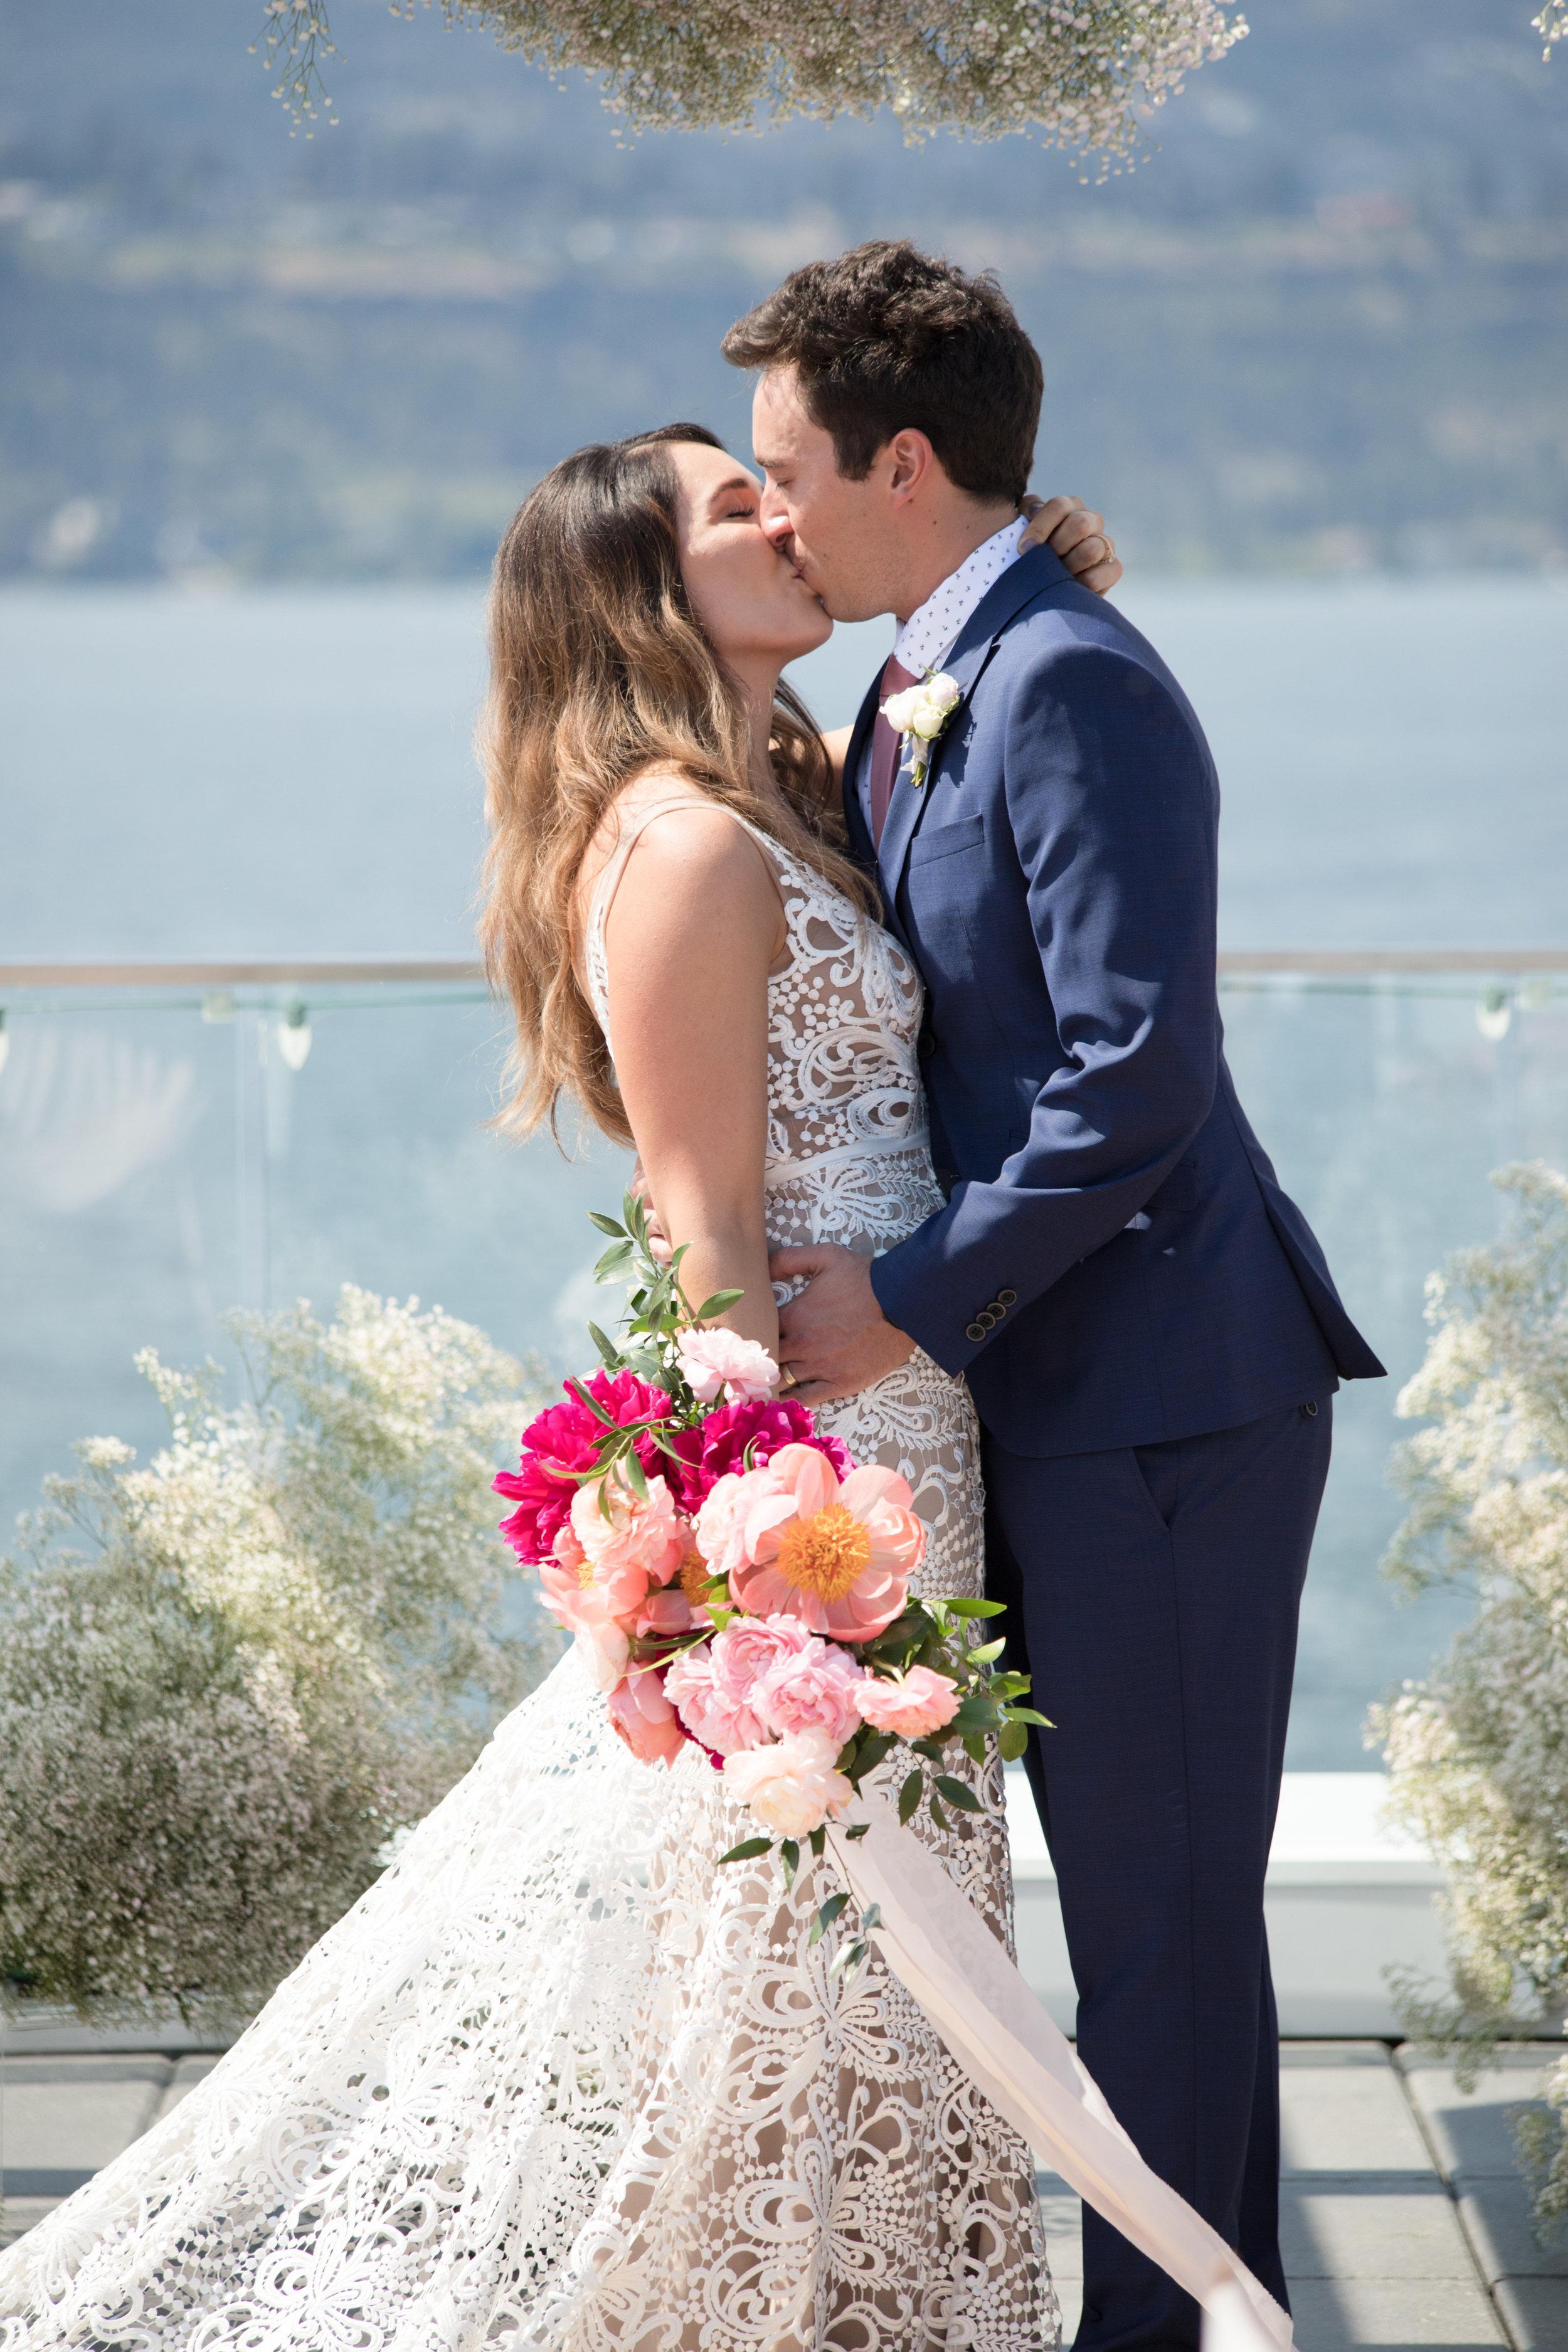 Kelowna Rooftop Wedding Ceremony.jpg